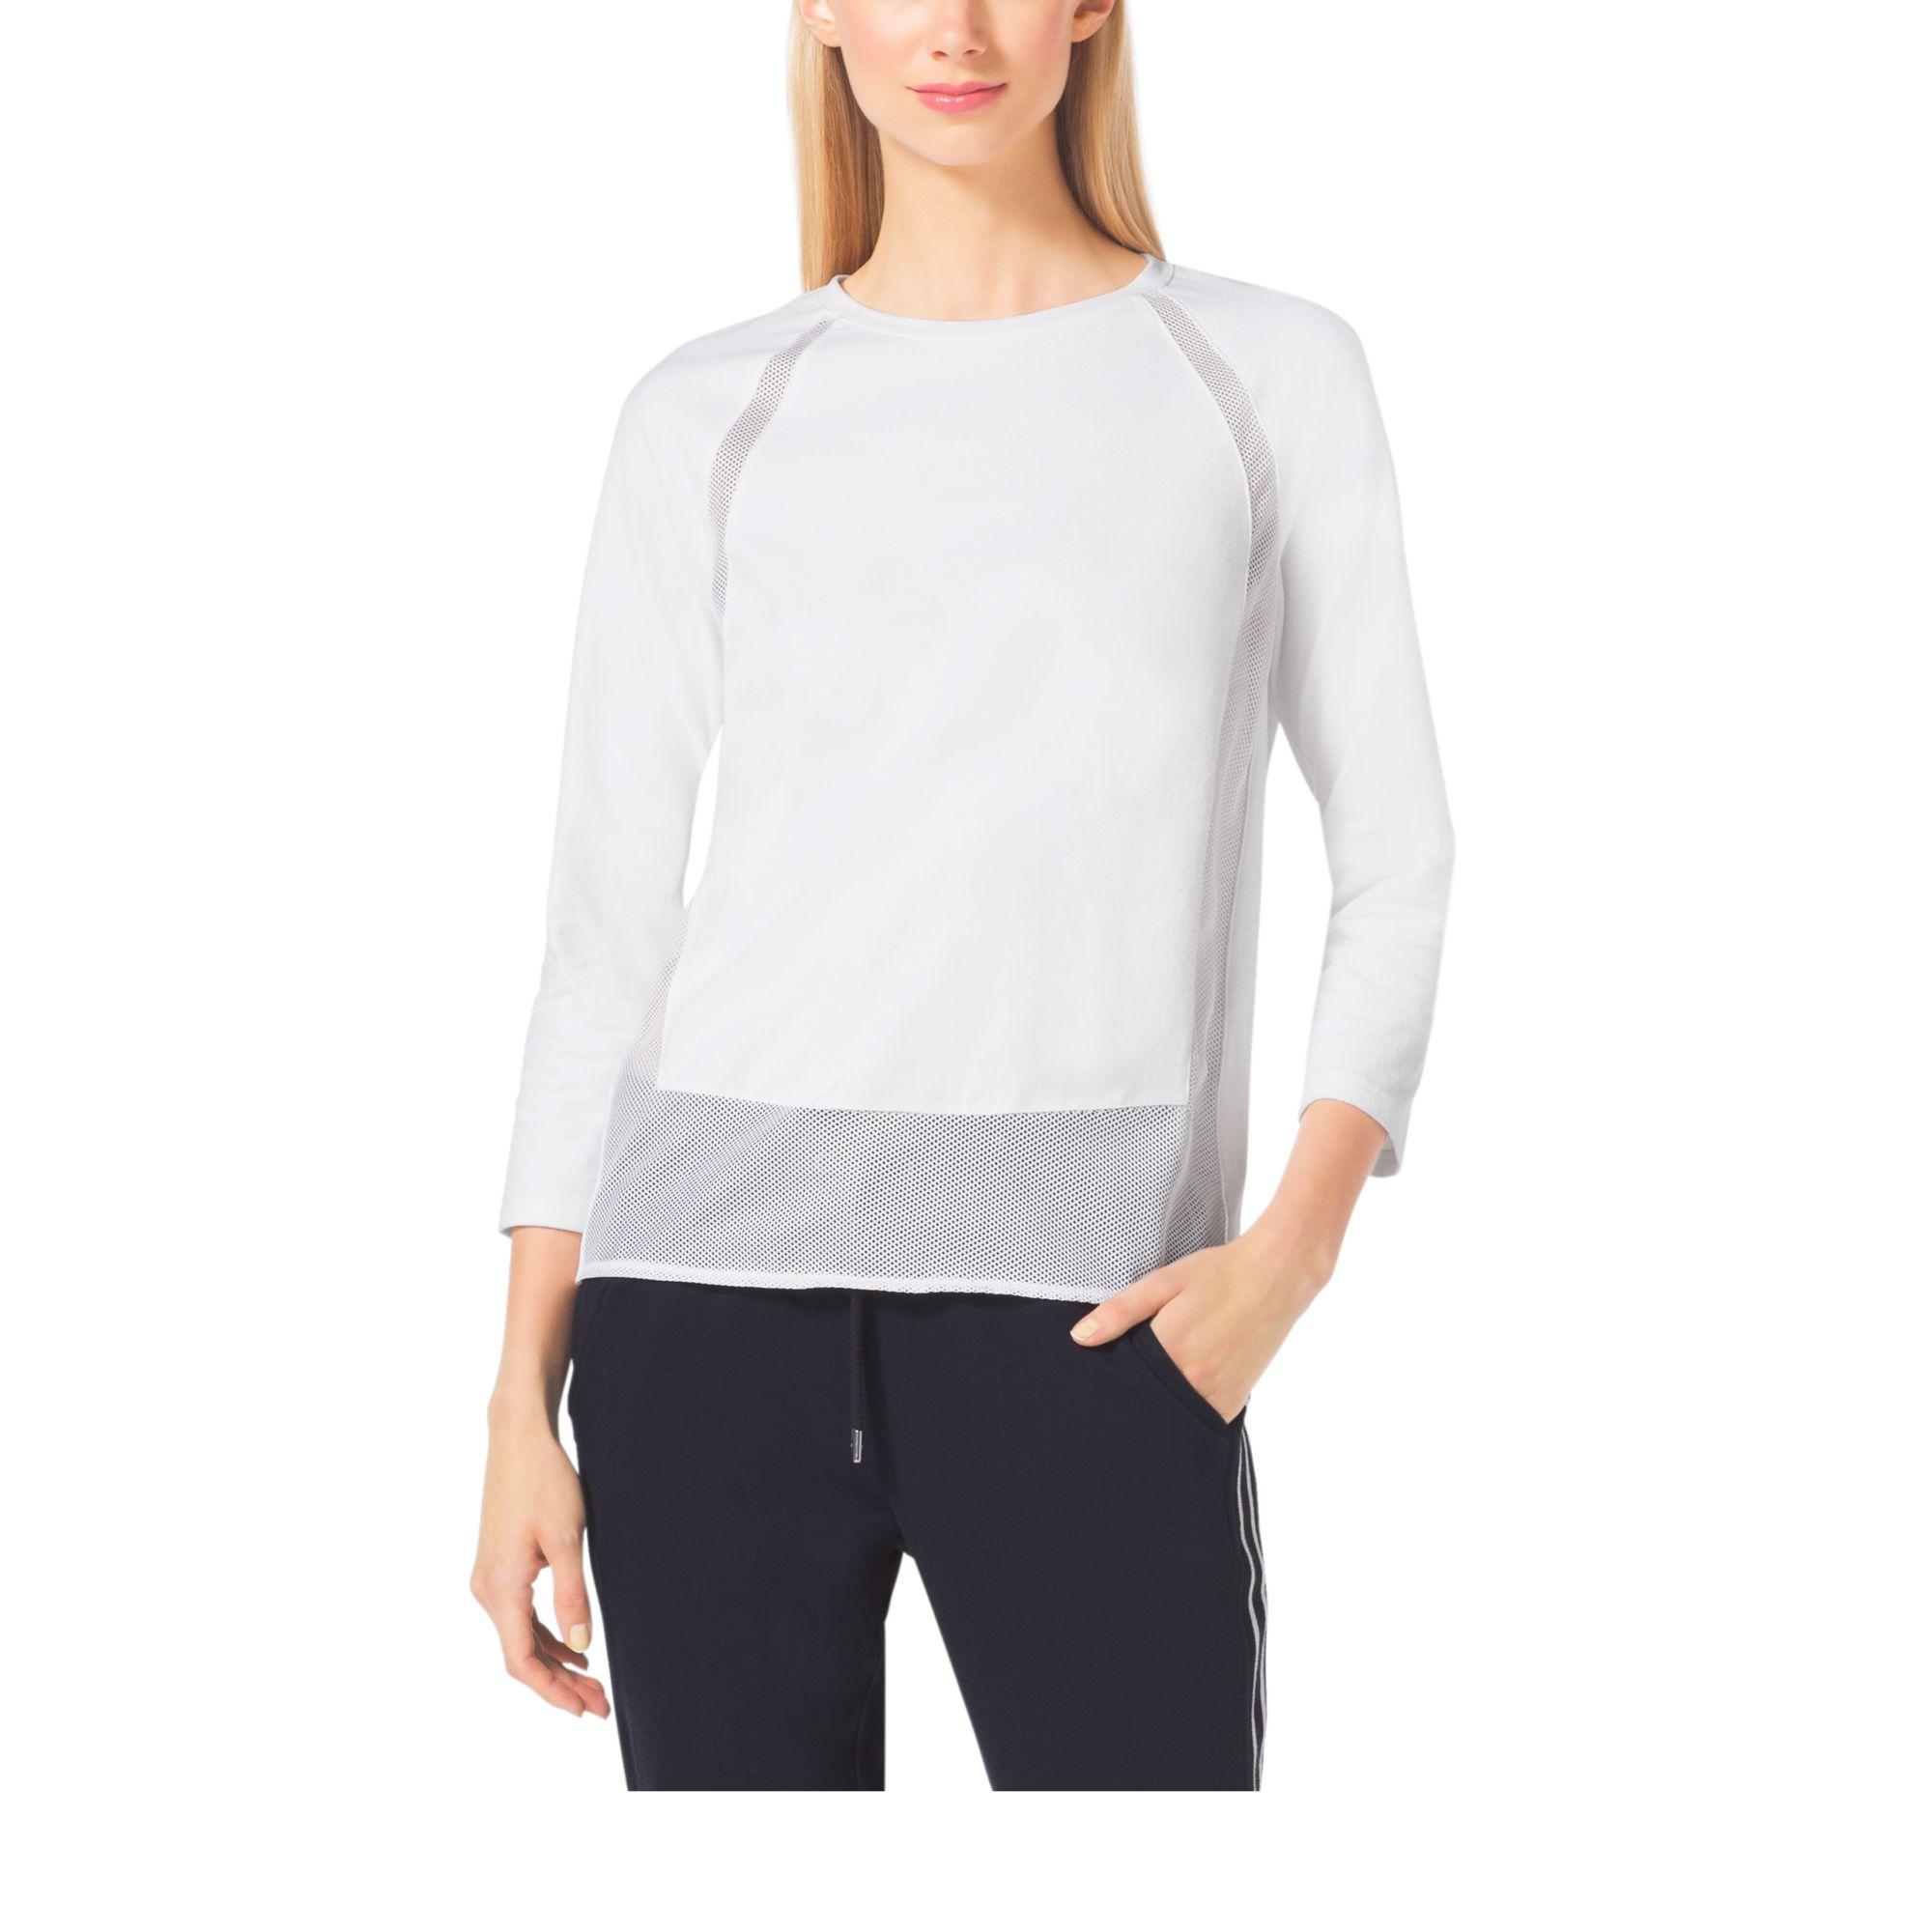 960960489fd88 Lyst - Michael Kors Sheer-panel Jersey Top in White